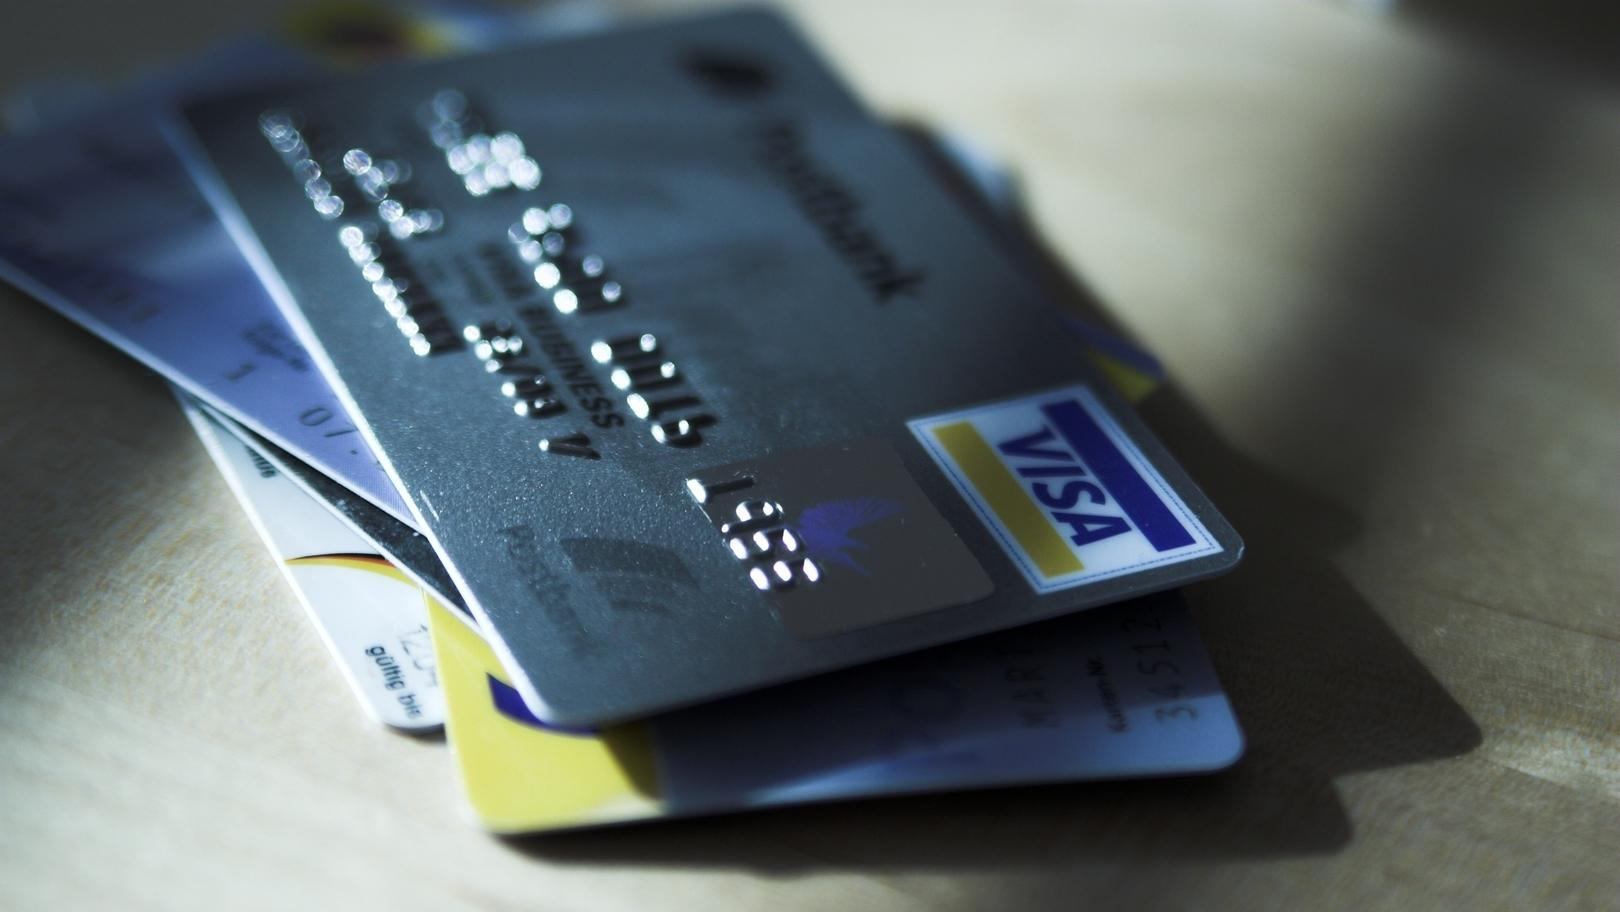 Stapel mit Kreditkarten